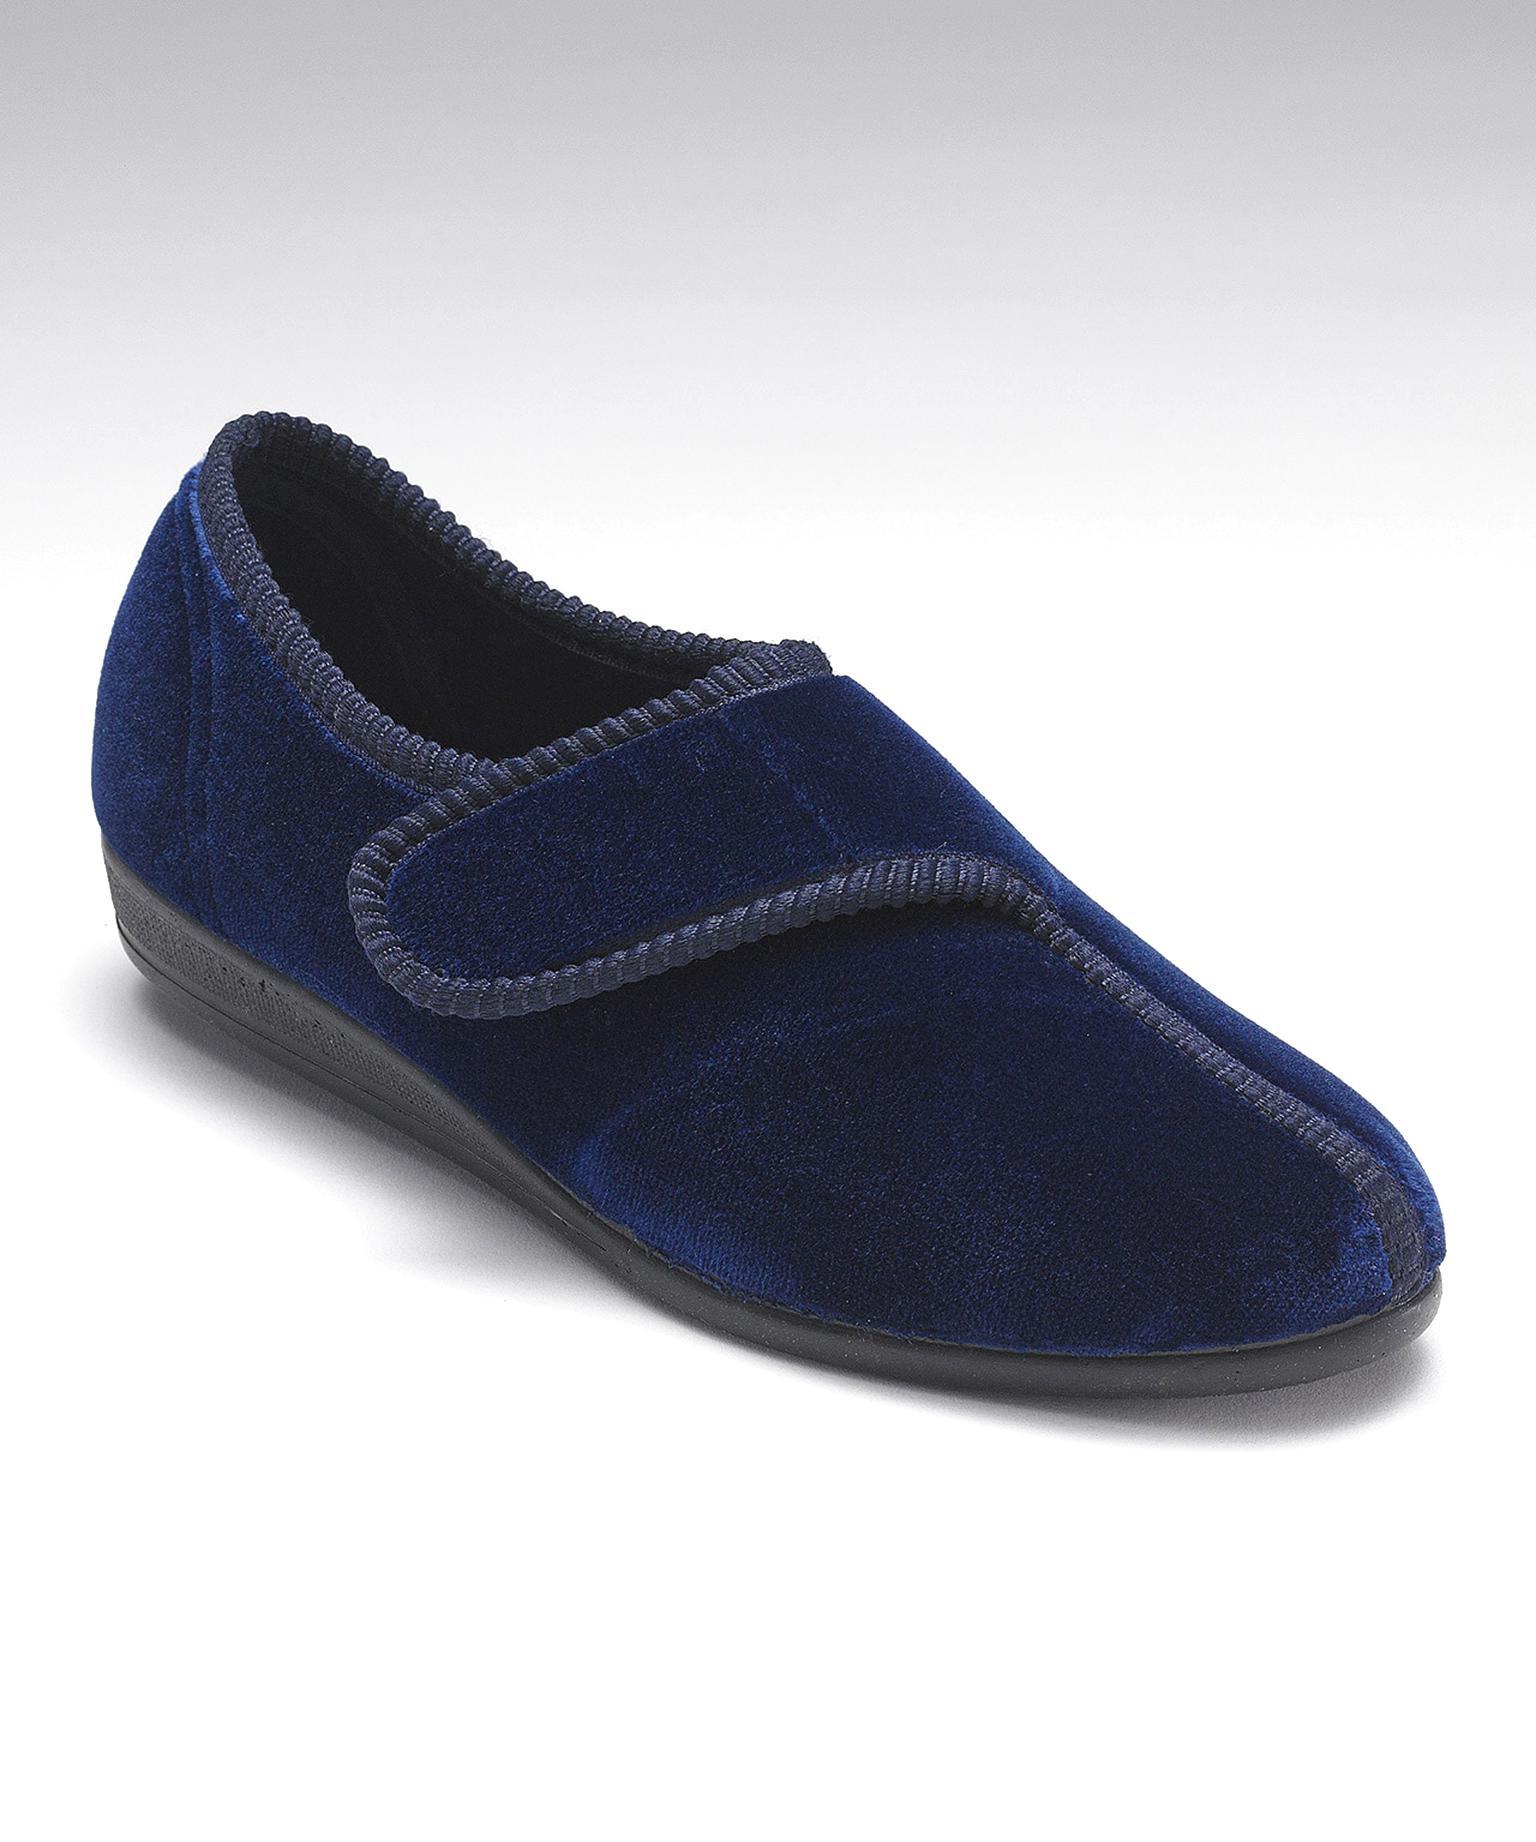 chaussons damart d'occasion